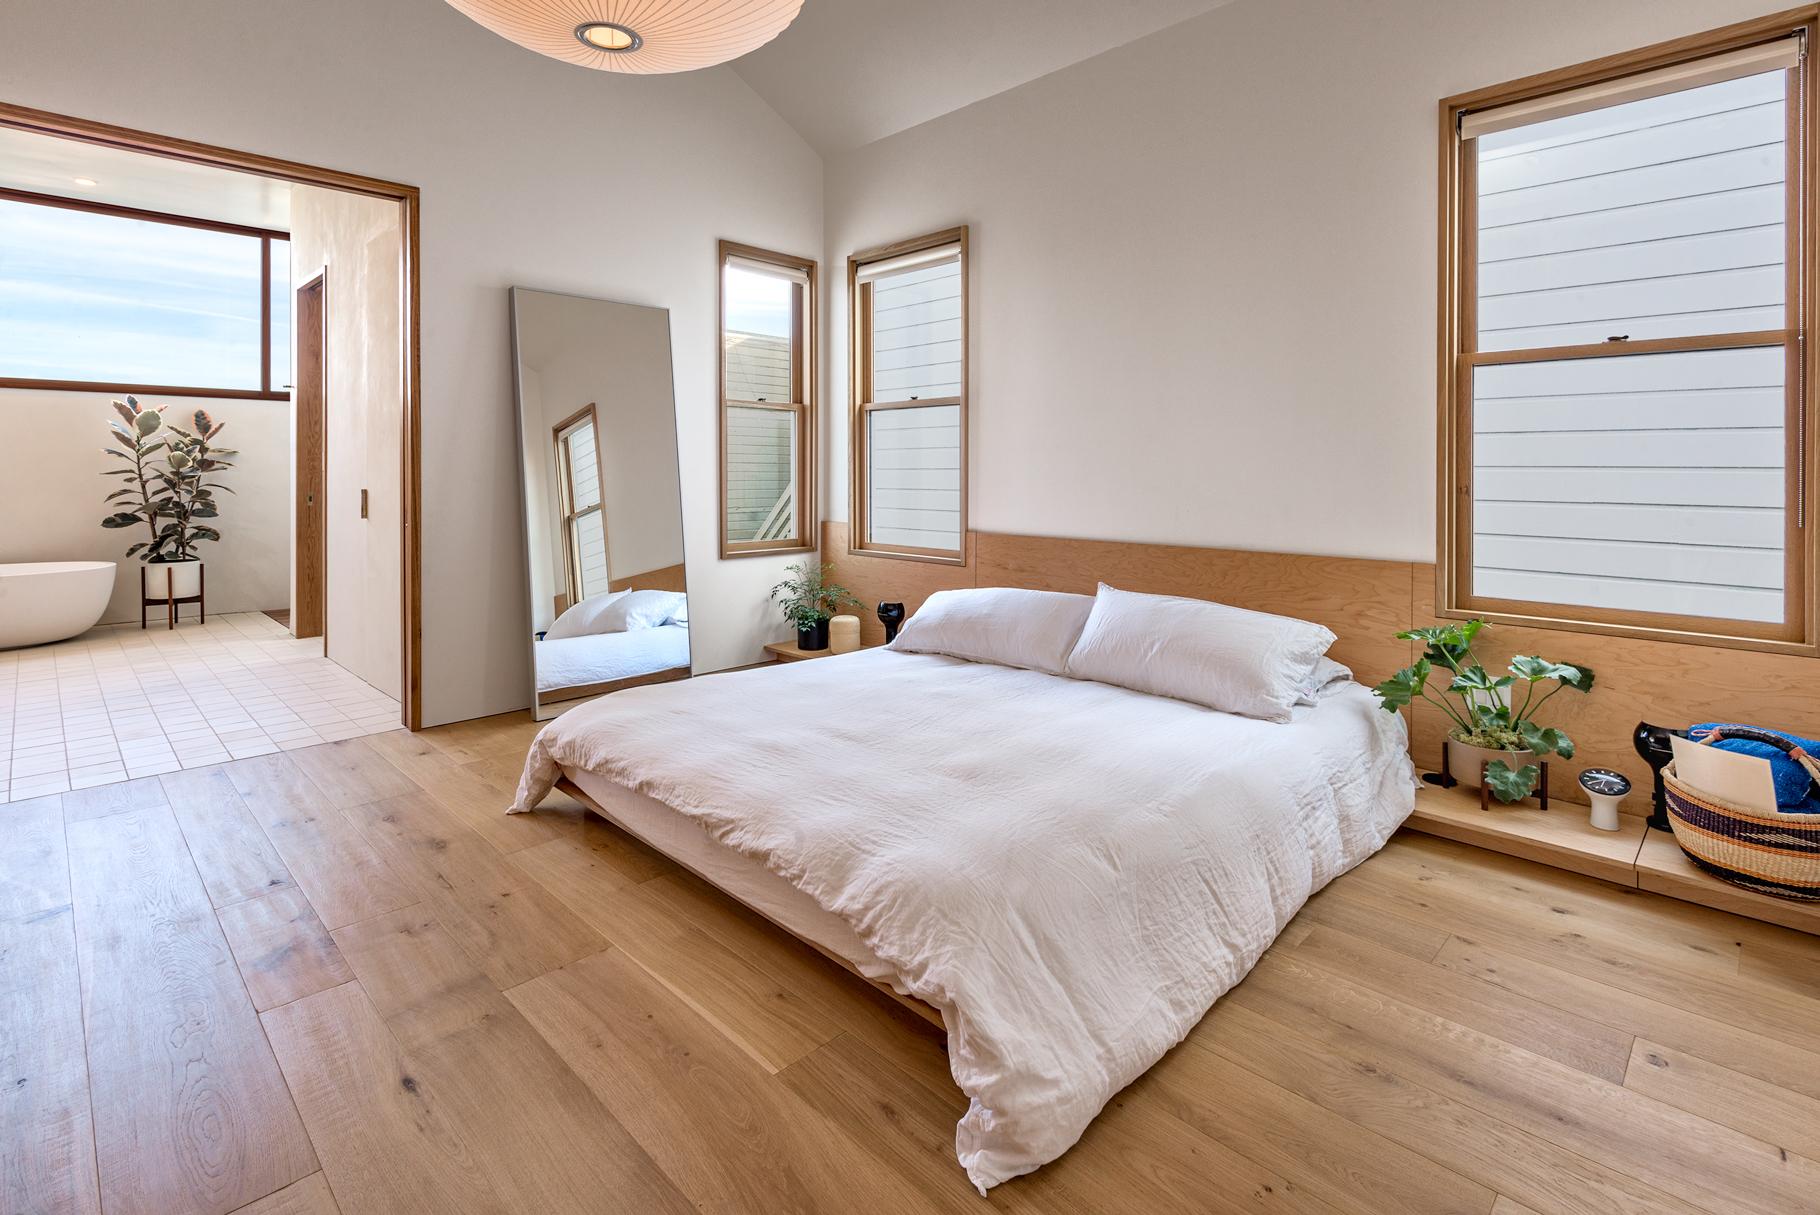 pix3 Scandinavian bedroom ideas that will inspire you to remodel